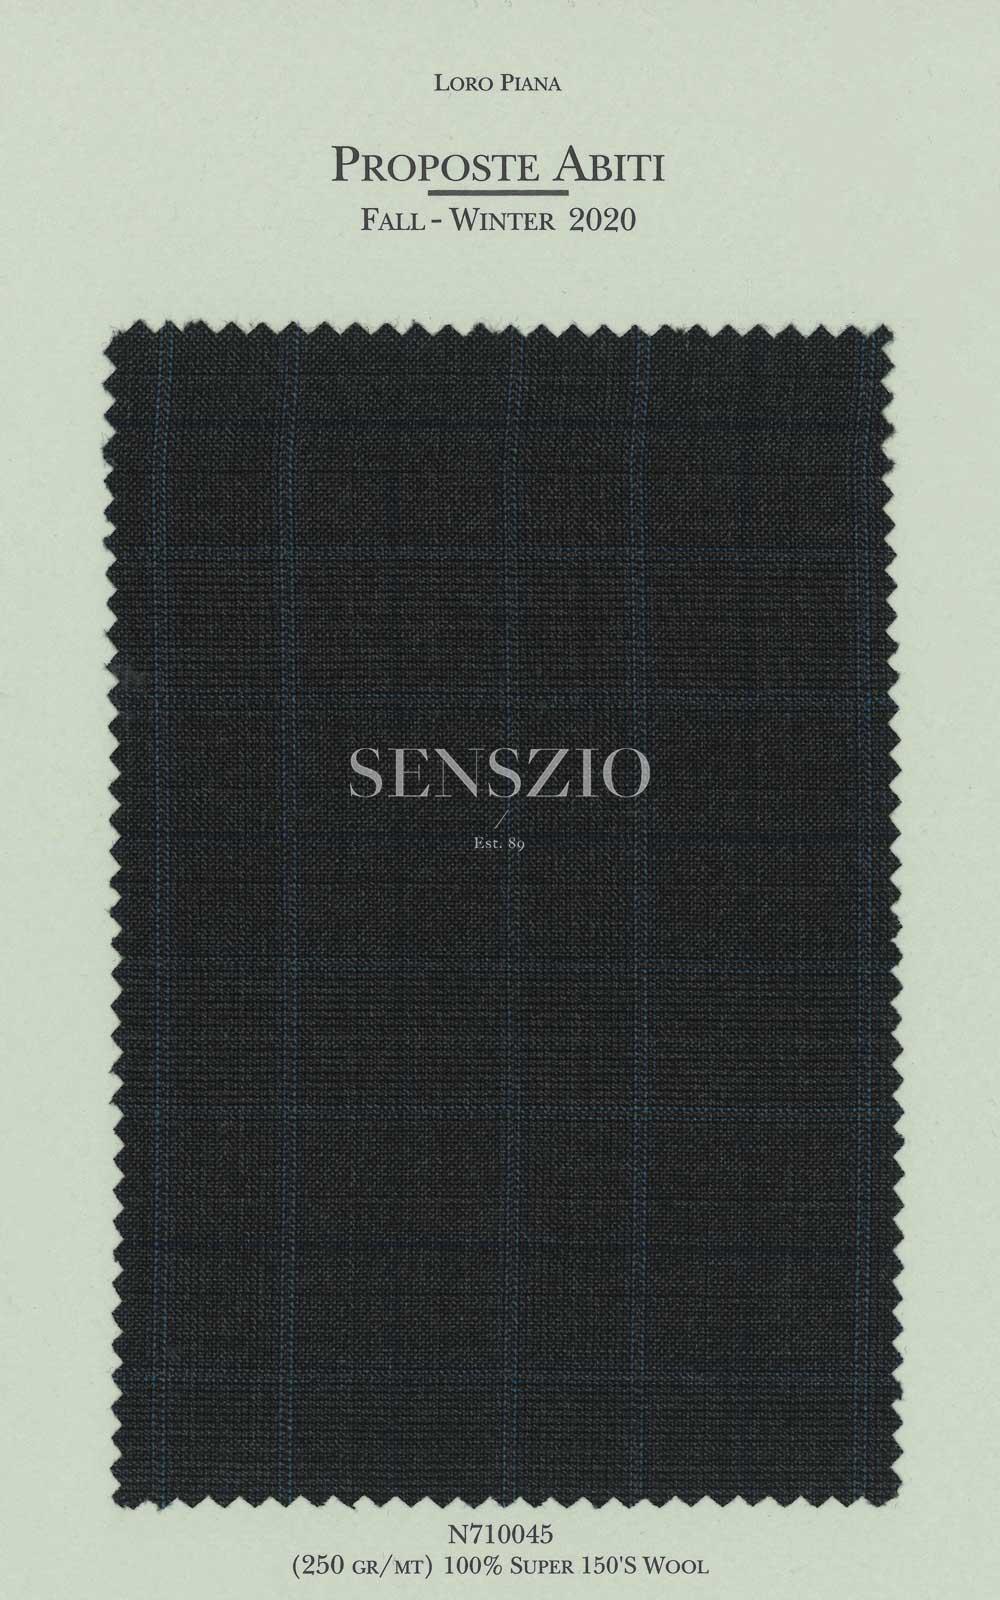 Lpn710045